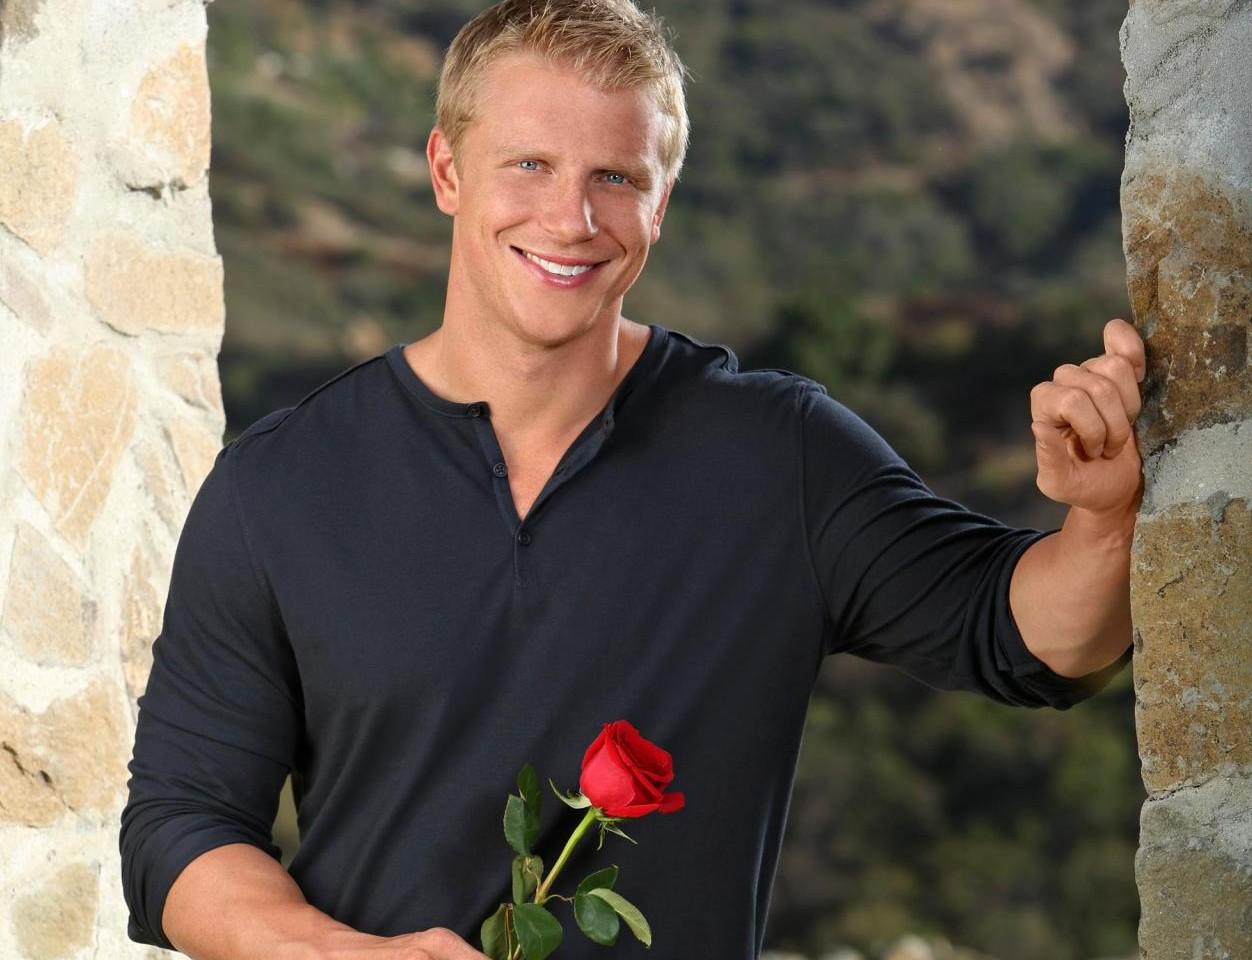 Sean Lowe The Bachelor season 17